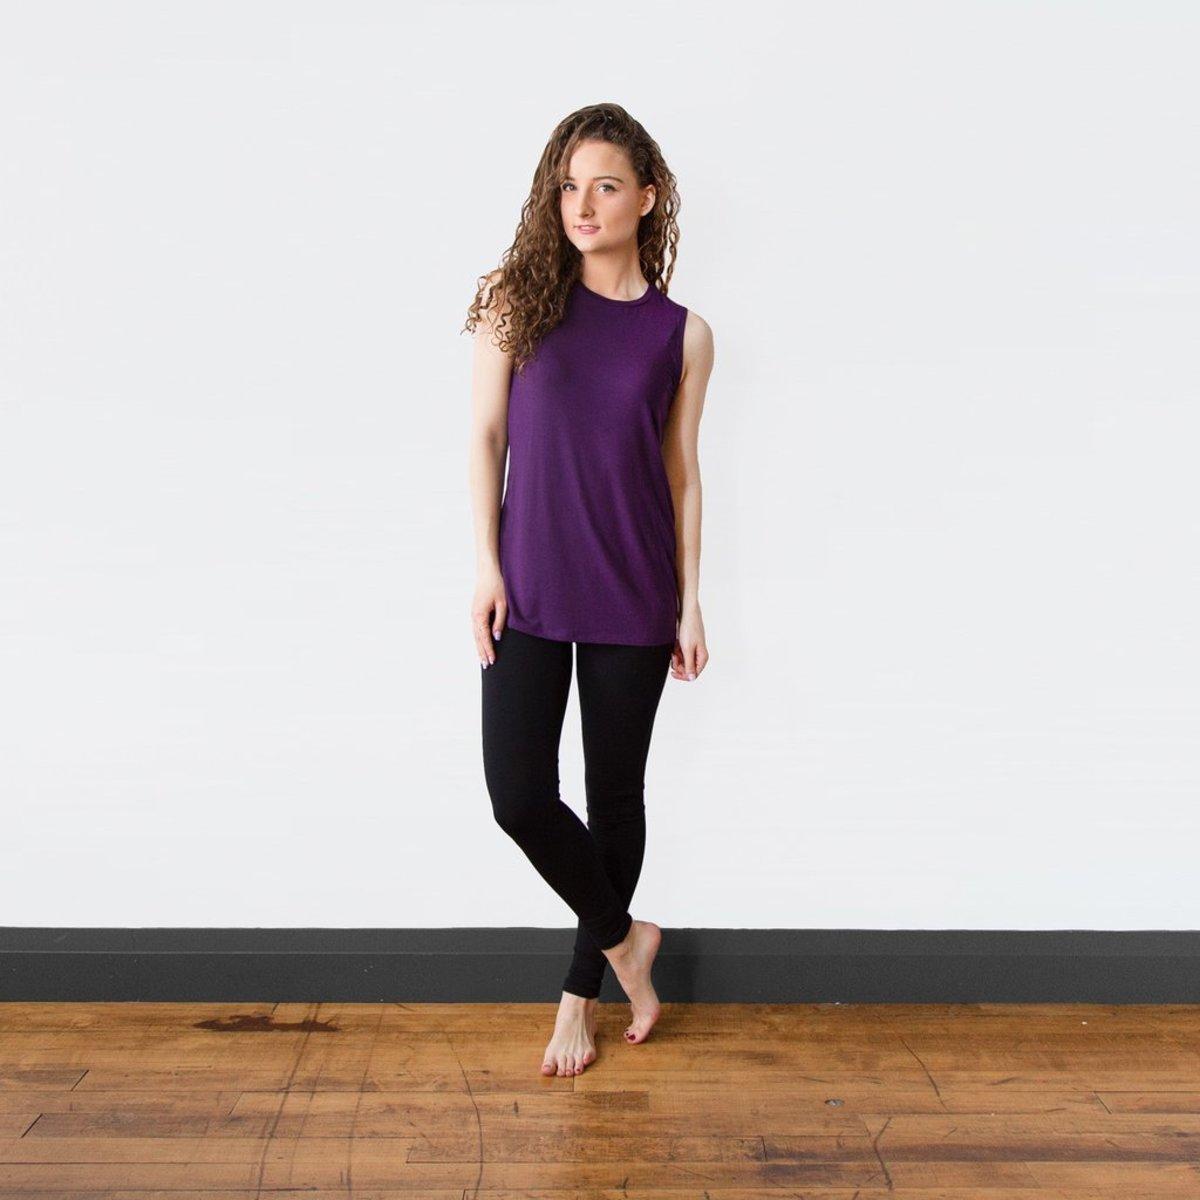 Sustainable yoga wear leggings.